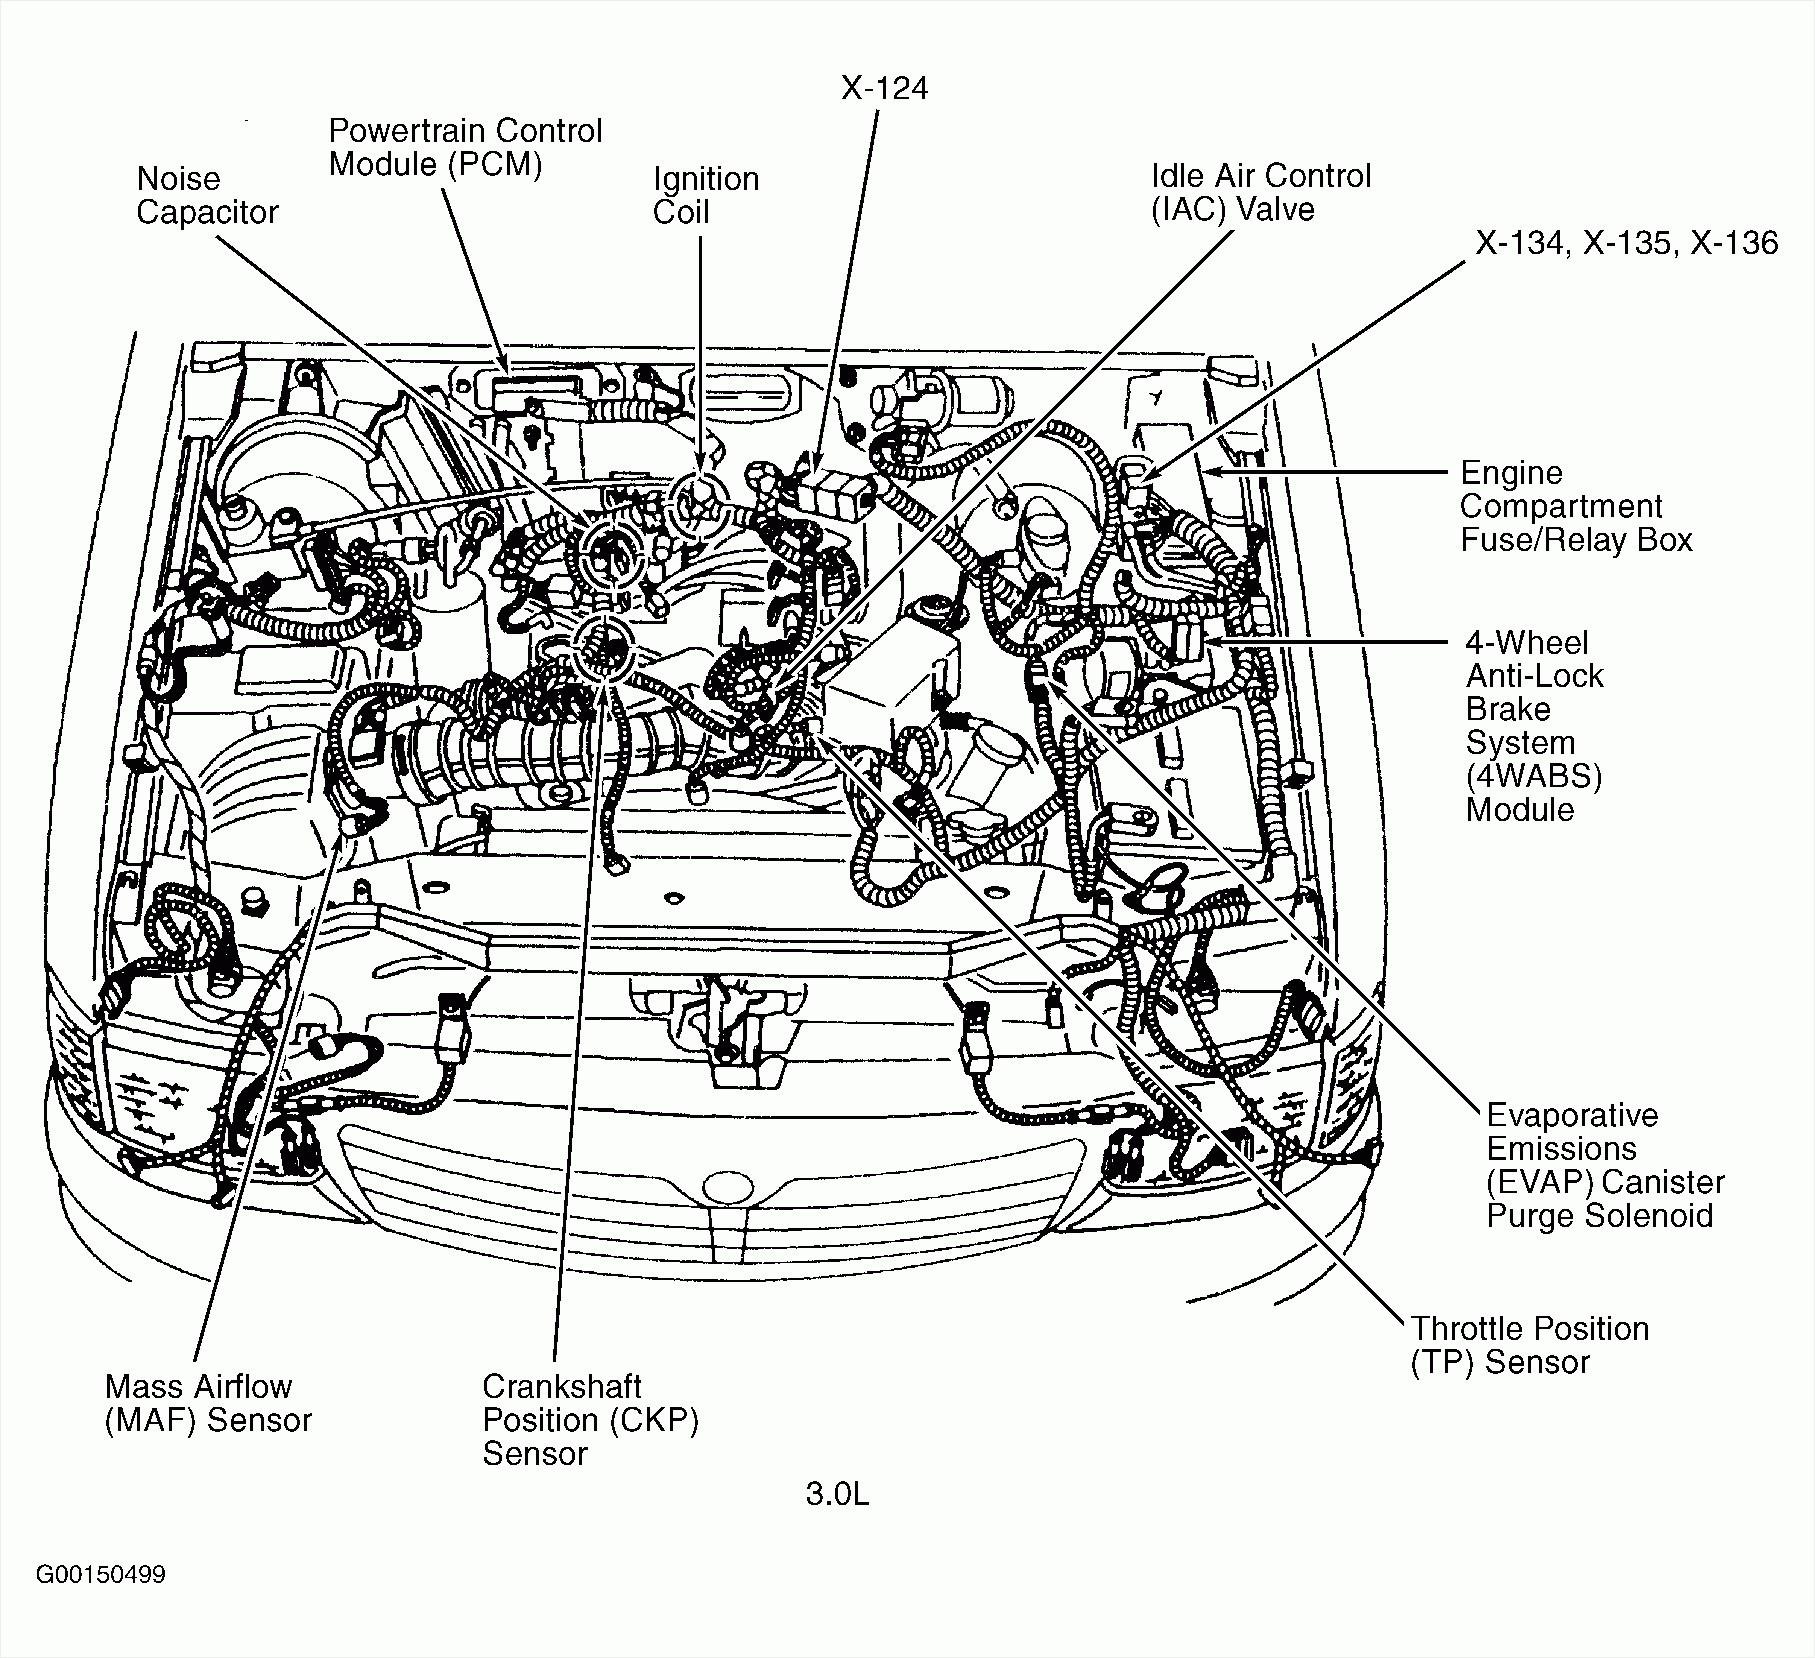 2001 Nissan Maxima Engine Diagram Nissan 3 0 Engine Diagram Wiring Diagram Mega Of 2001 Nissan Maxima Engine Diagram